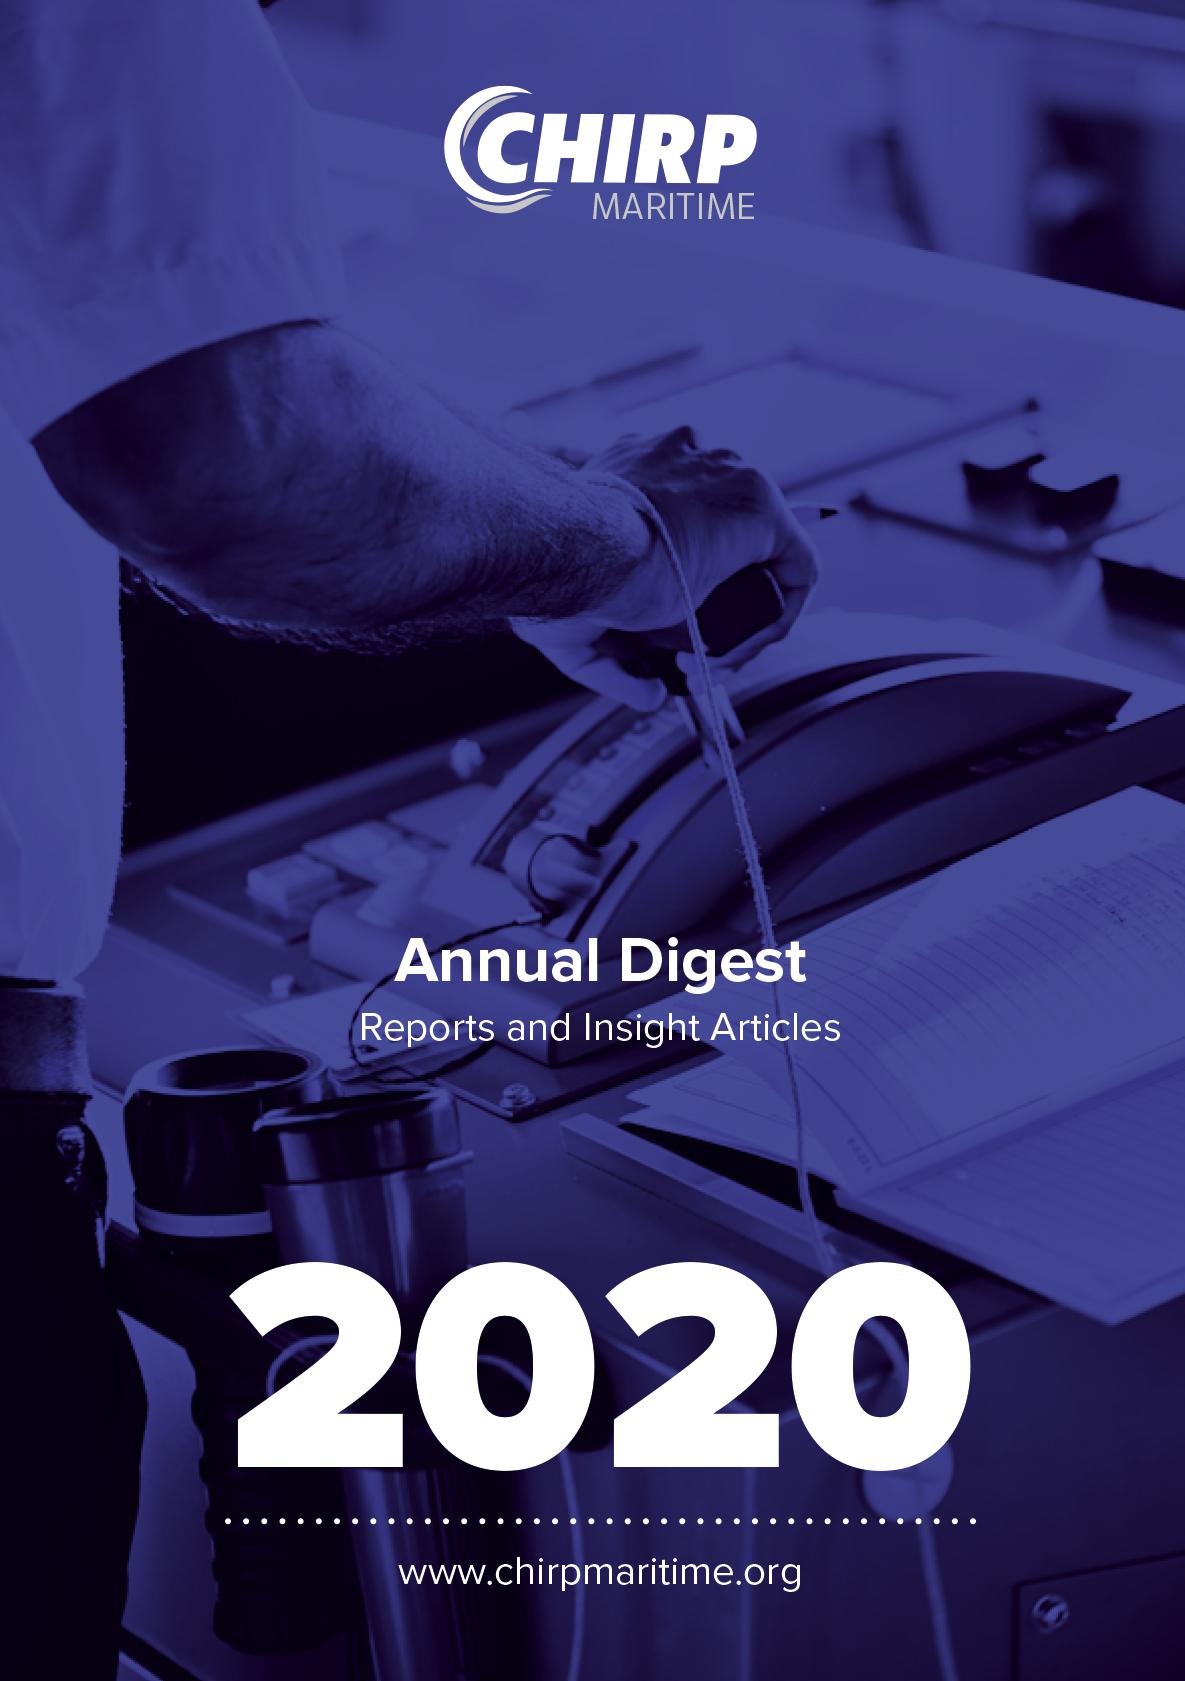 chirp-2020-annual-digest.jpg